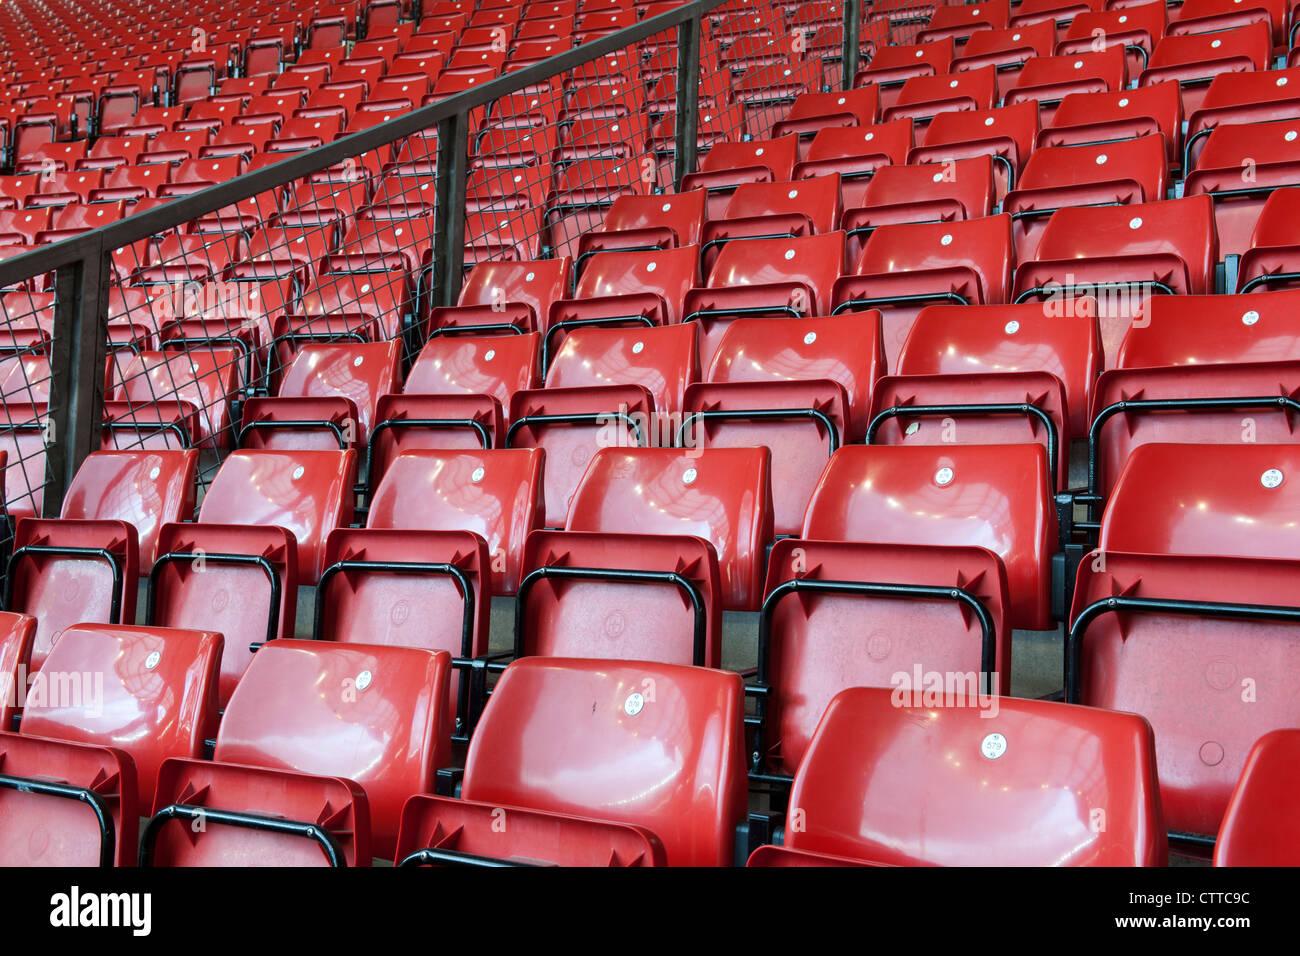 Friends Provident St Mary's Football Stadium, home of Southampton Football Club, At Mary's, Southampton, - Stock Image